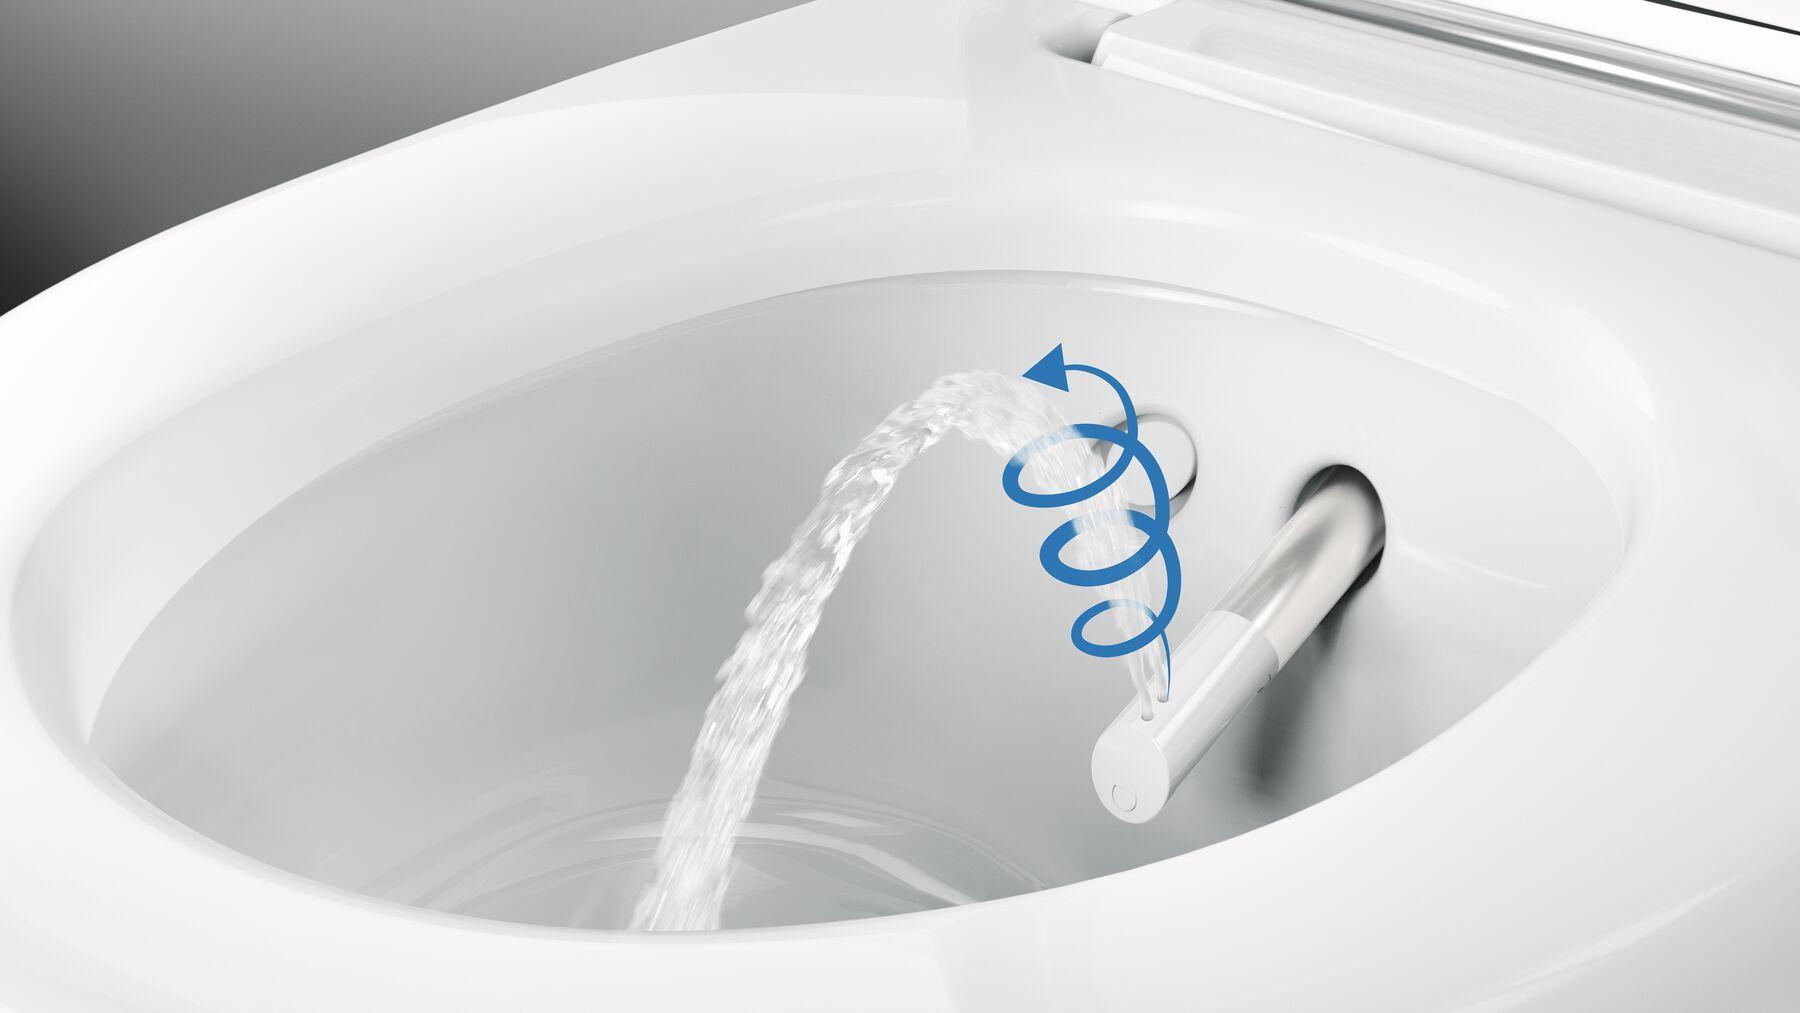 AquaCleanMeraComfortWhirlSpray-geberit_dam-media-large